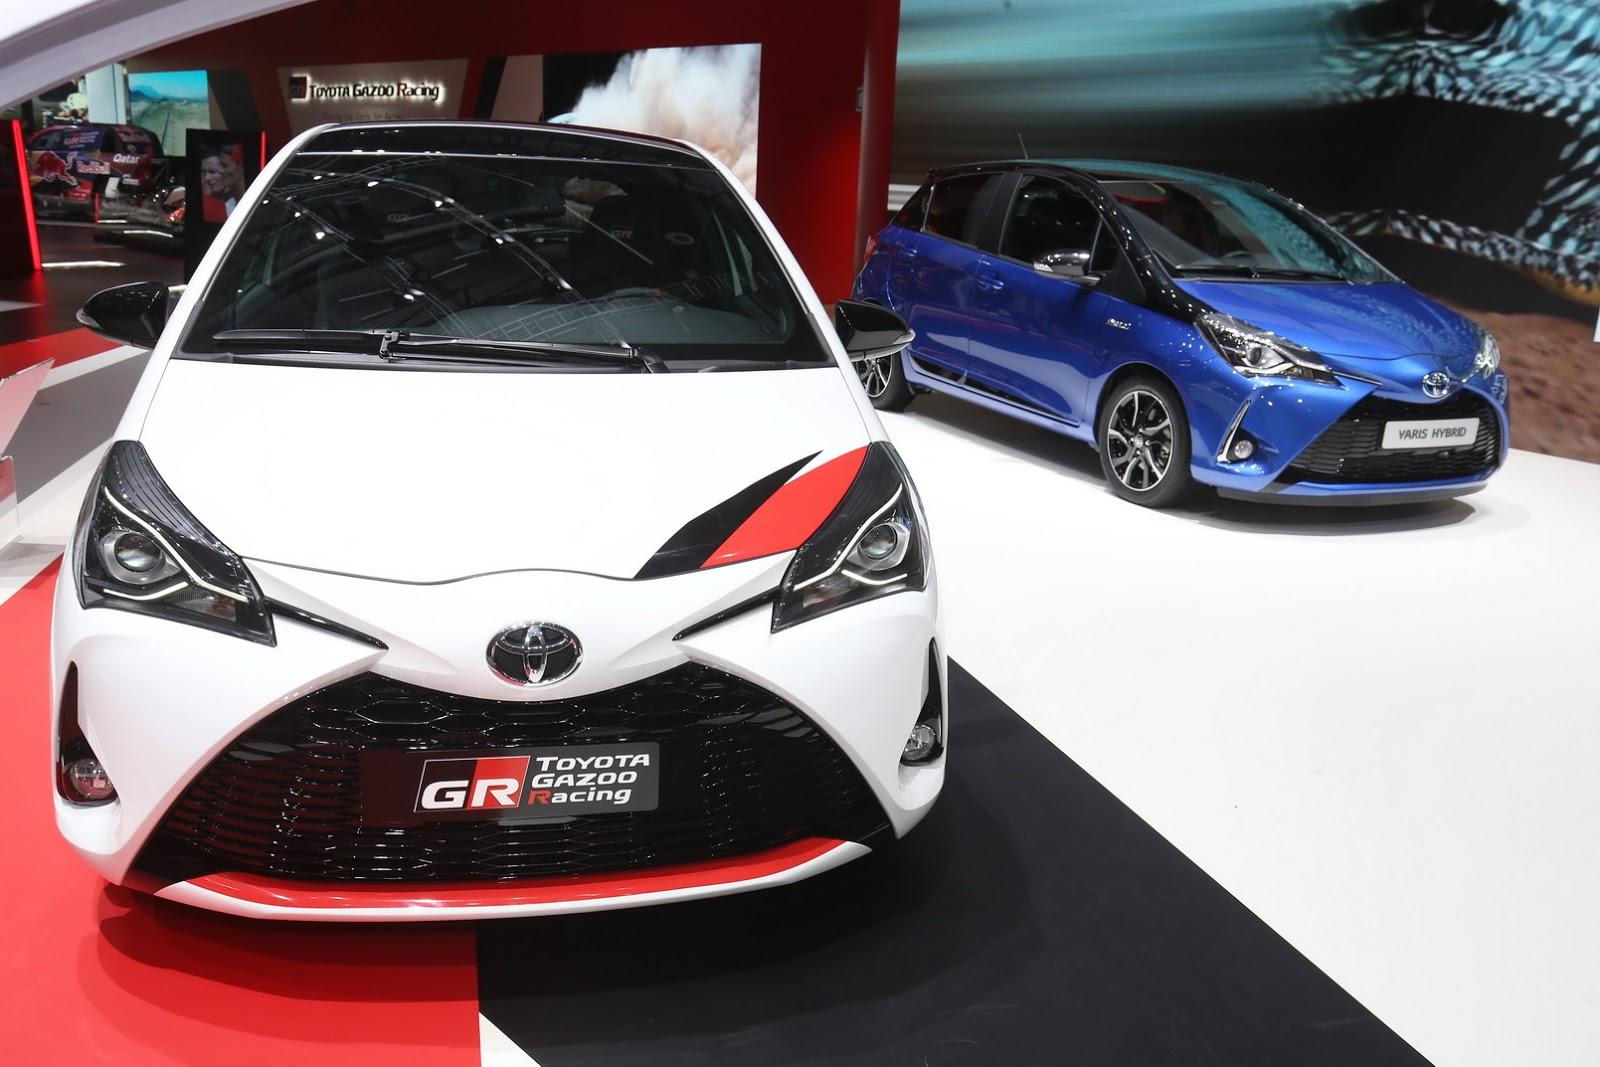 Toyota Yaris Trd Limited Harga Grand New Avanza Di Pontianak Grmn Will Be To 400 Units In Europe